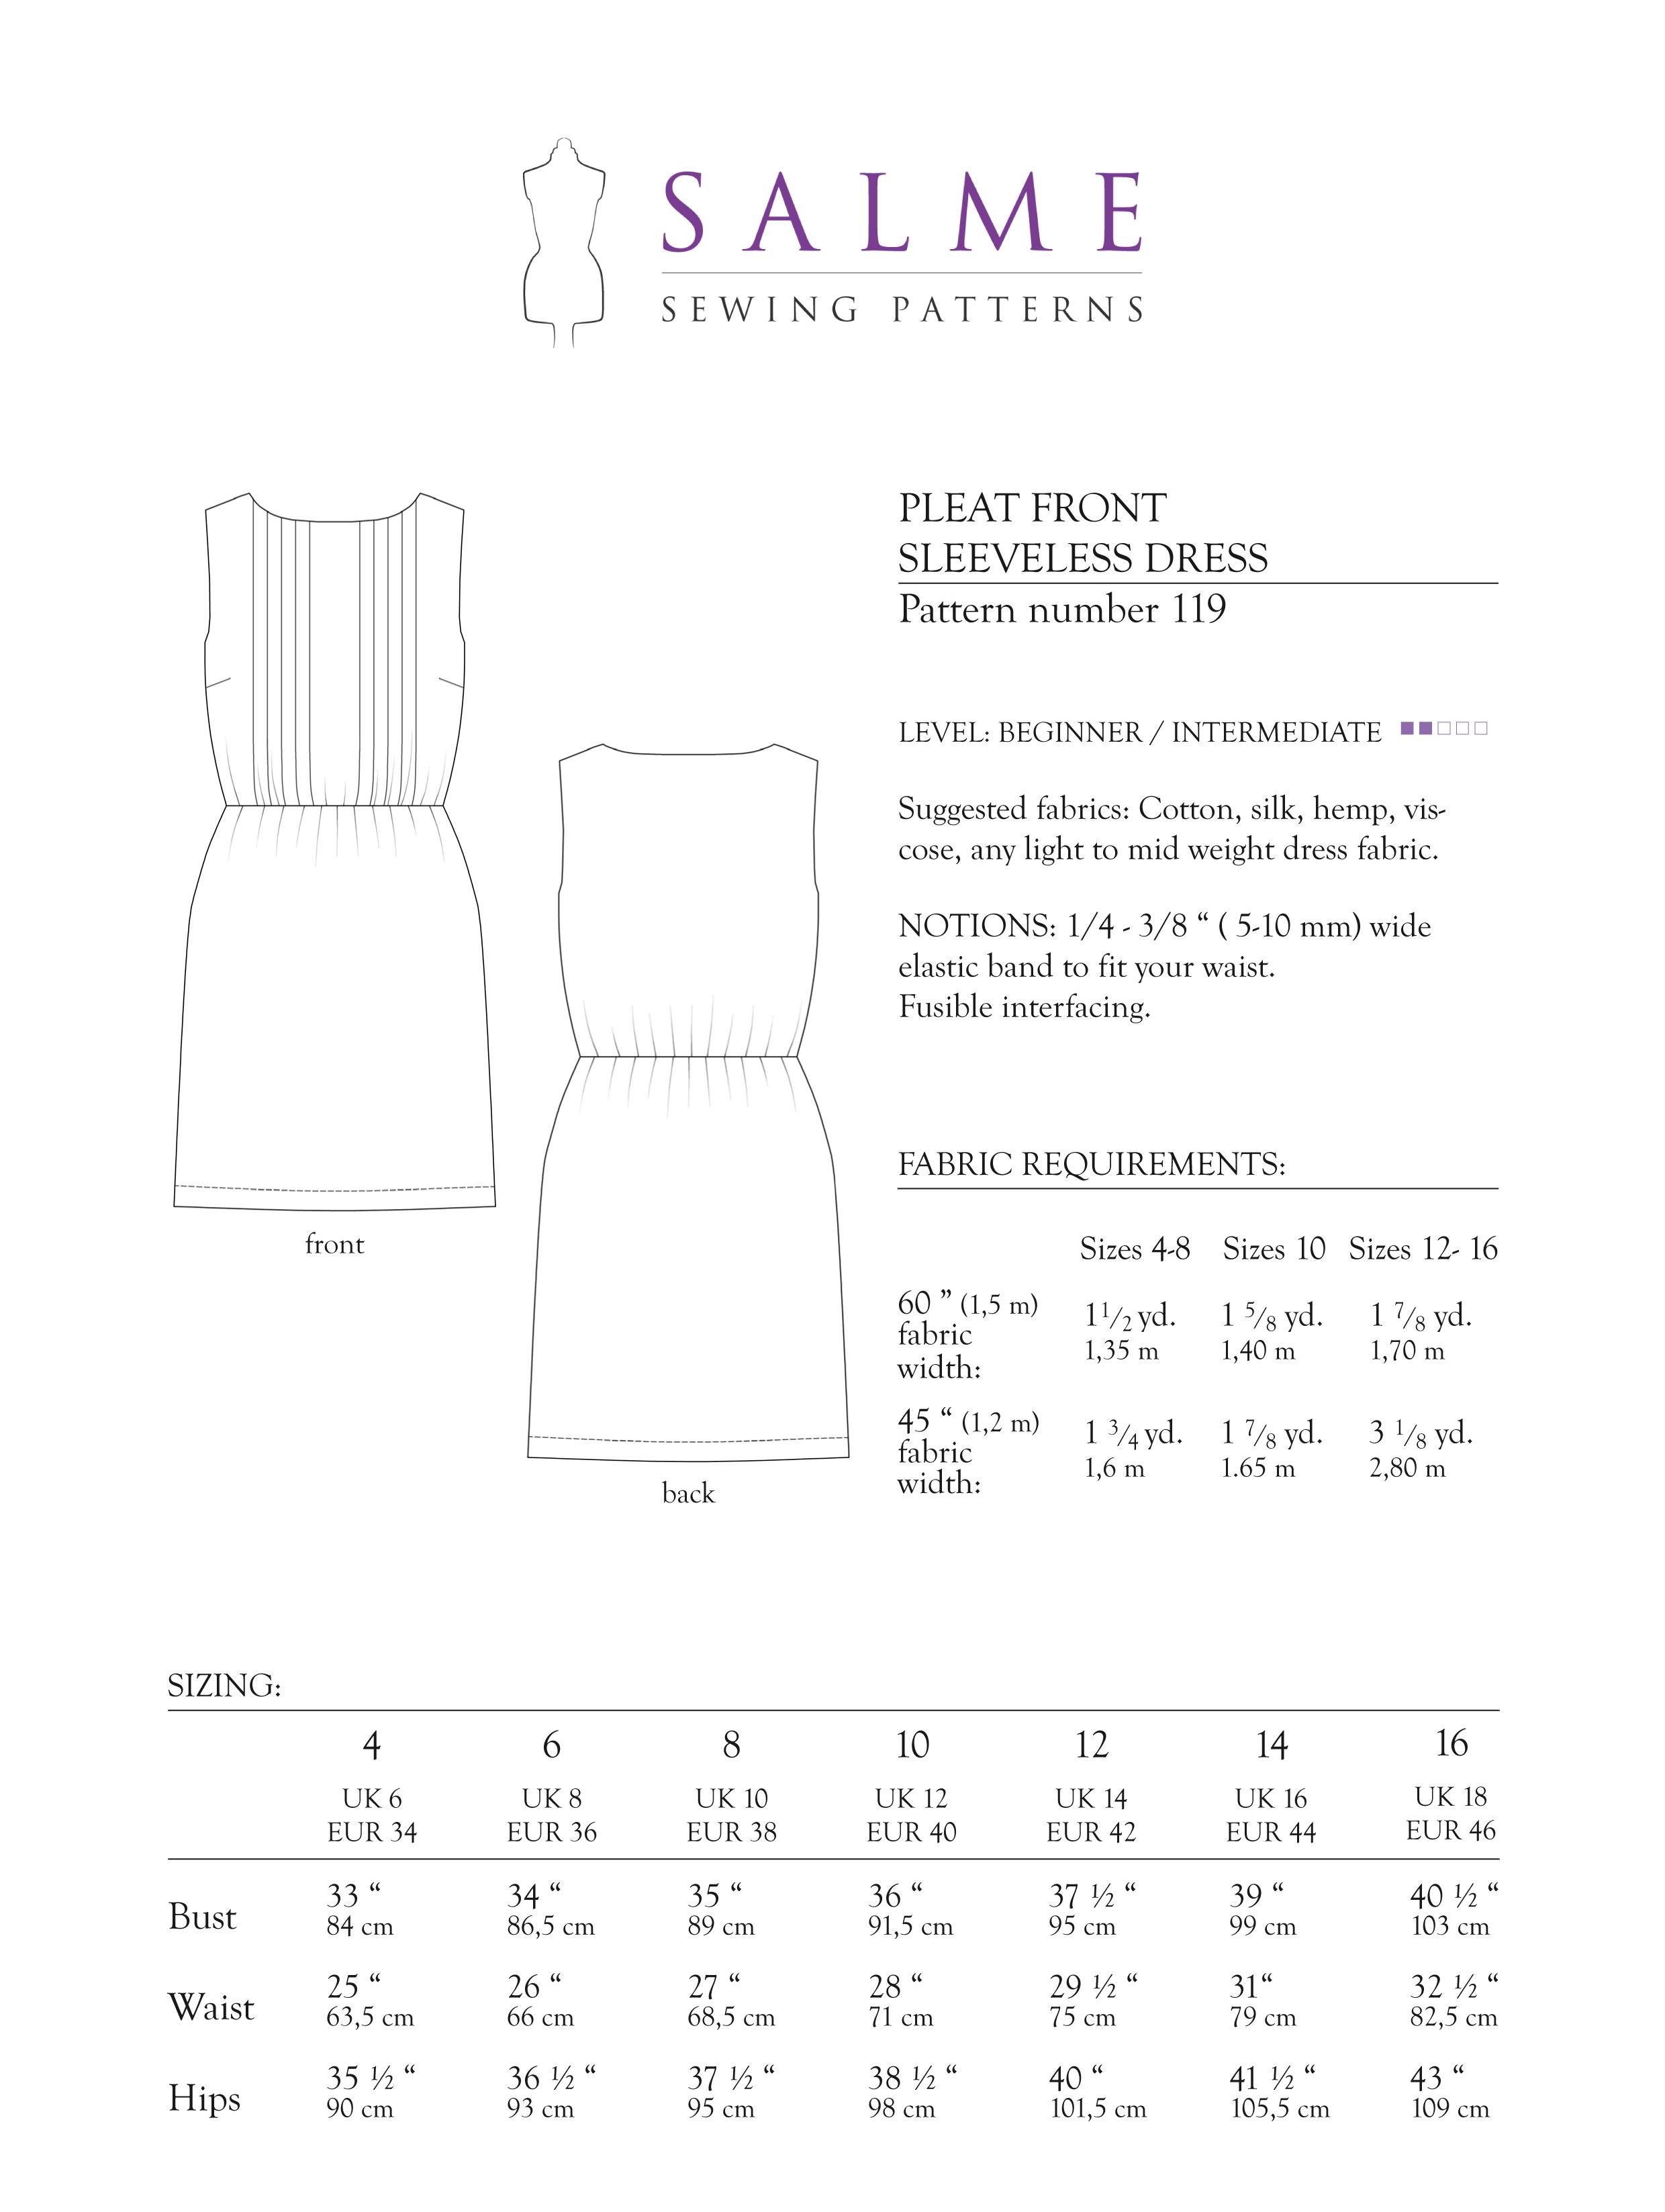 Salme sewing patterns 119 pleat front sleeveless dress prevnext jeuxipadfo Gallery